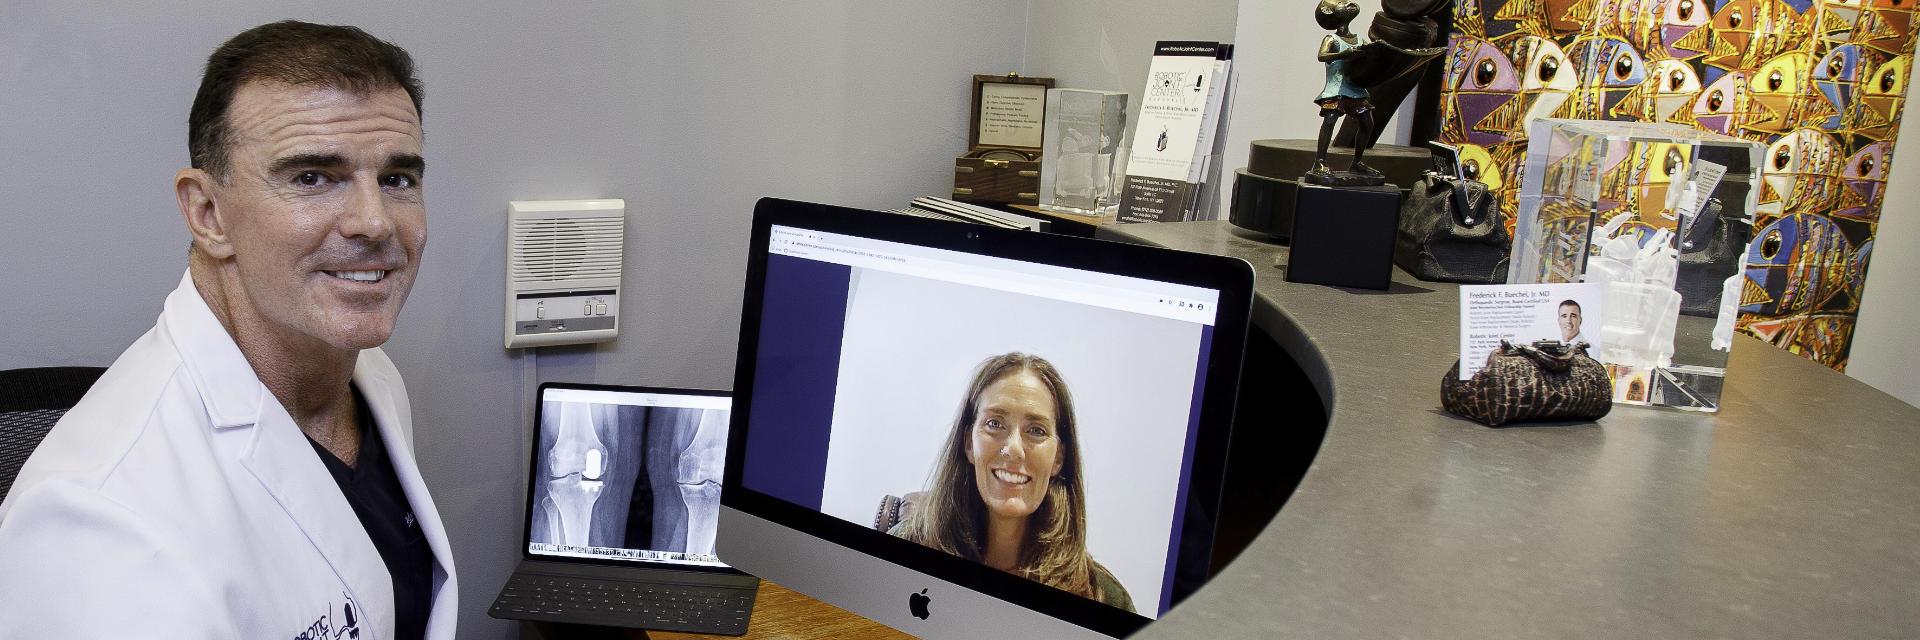 Dr. Buechel during online meeting.